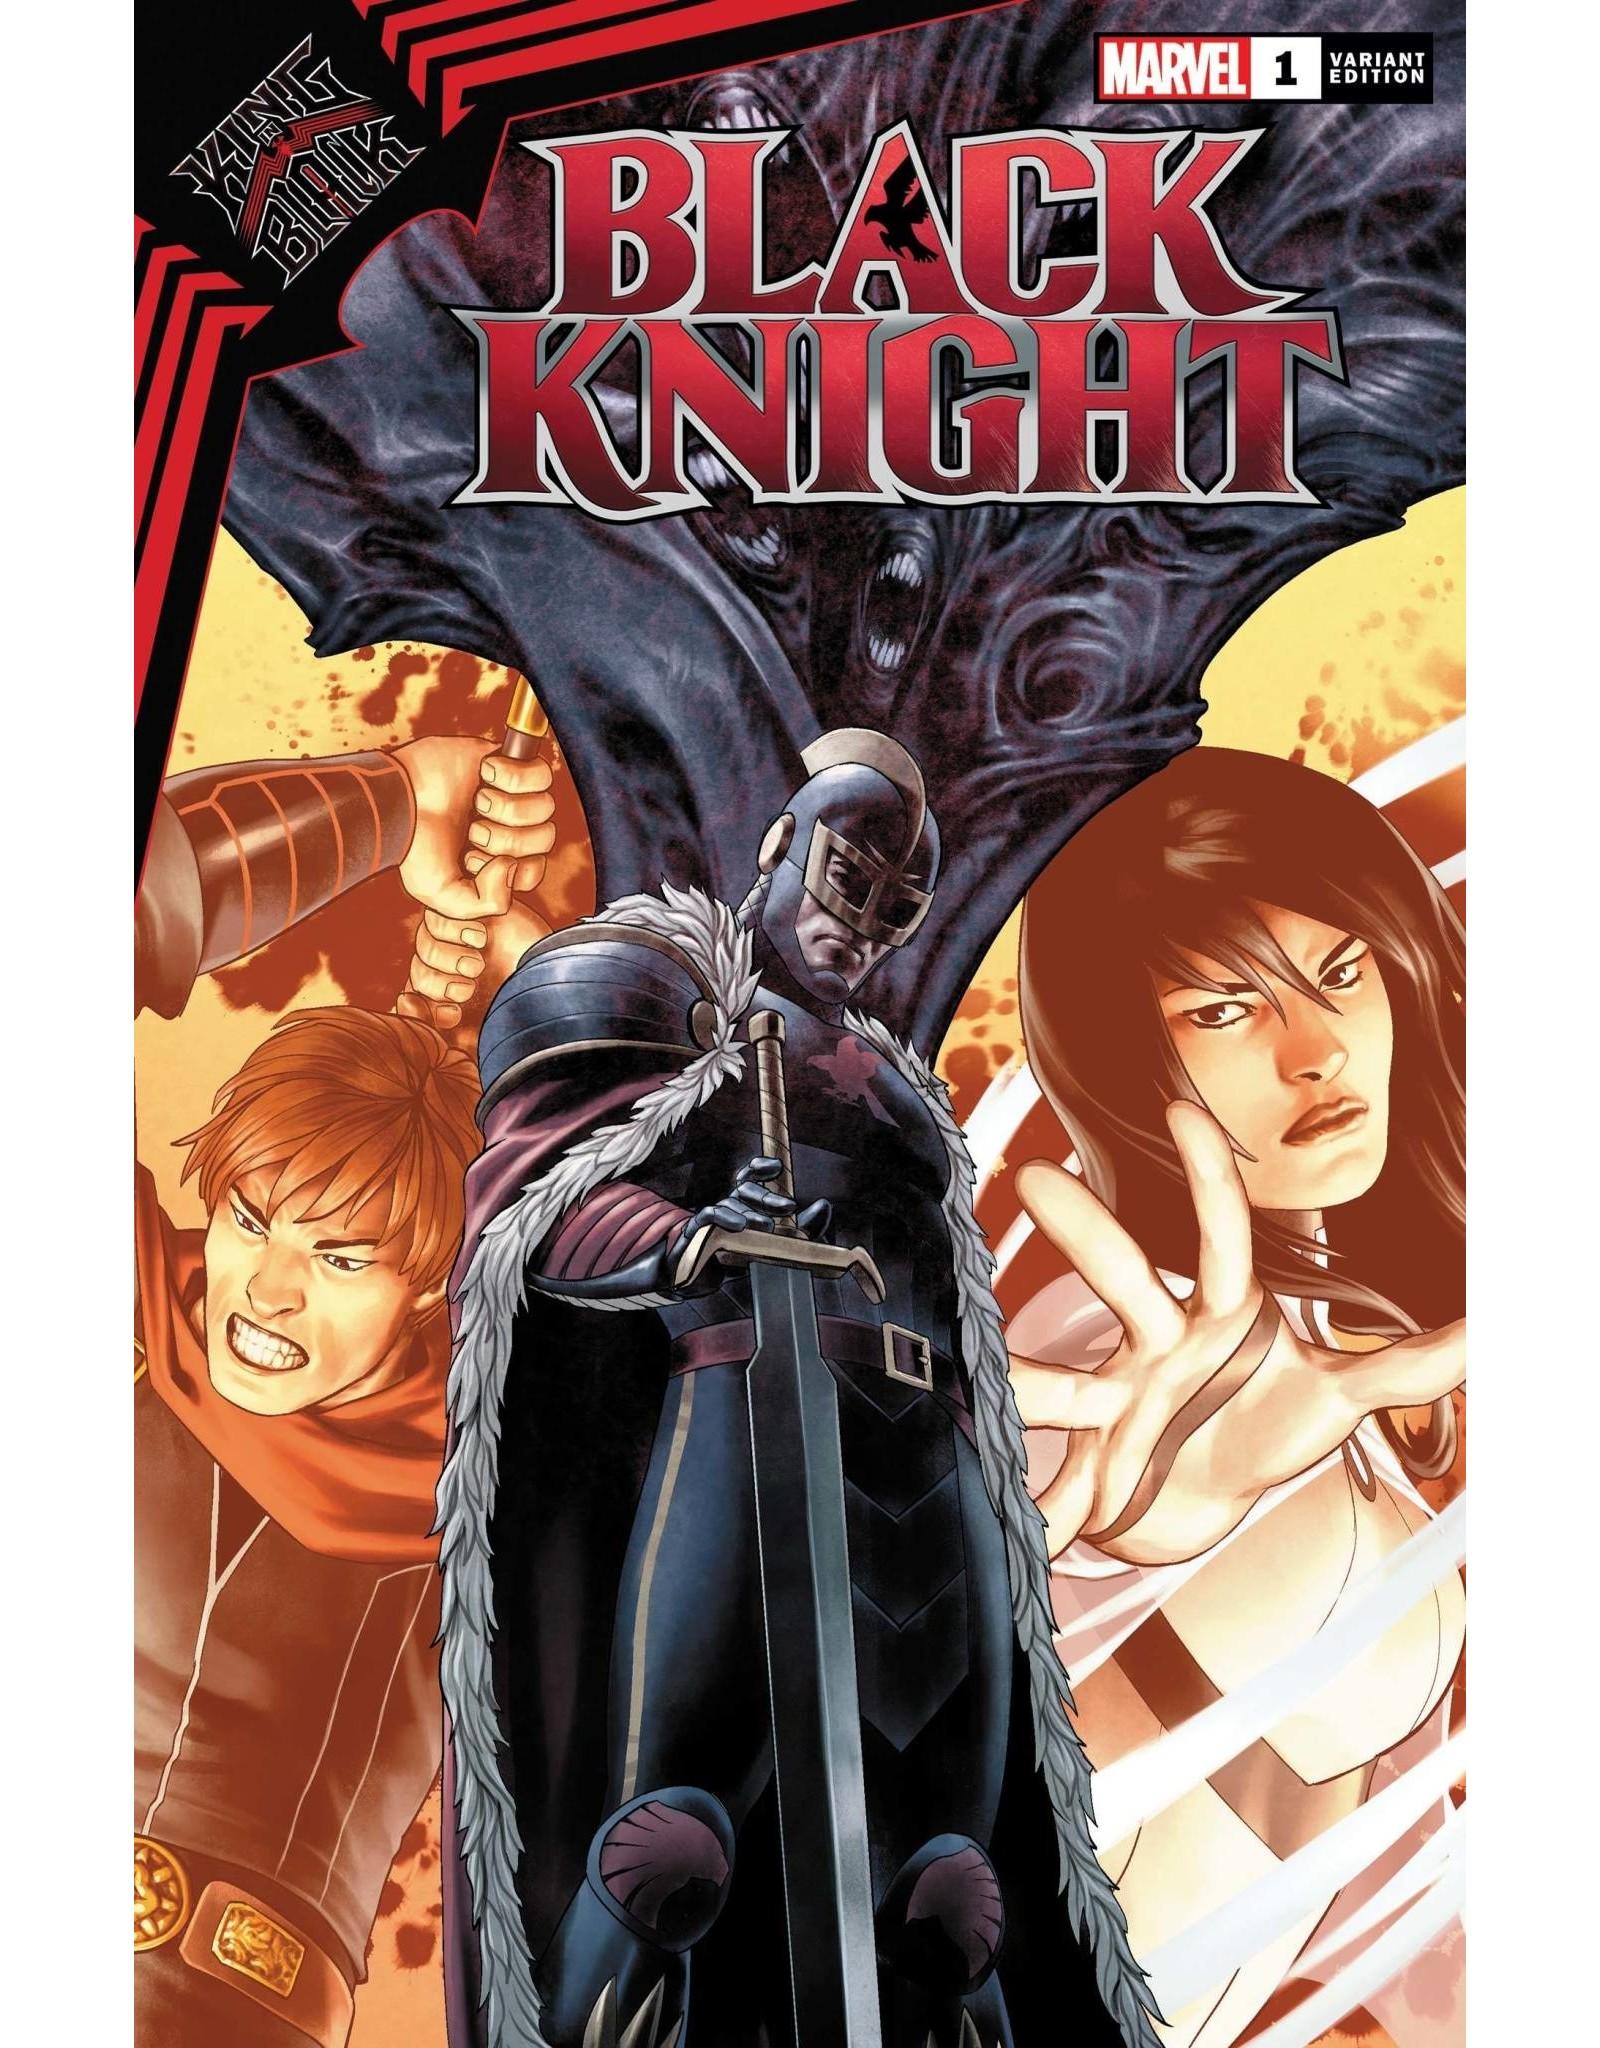 Marvel Comics KING IN BLACK BLACK KNIGHT #1 SAIZ VAR